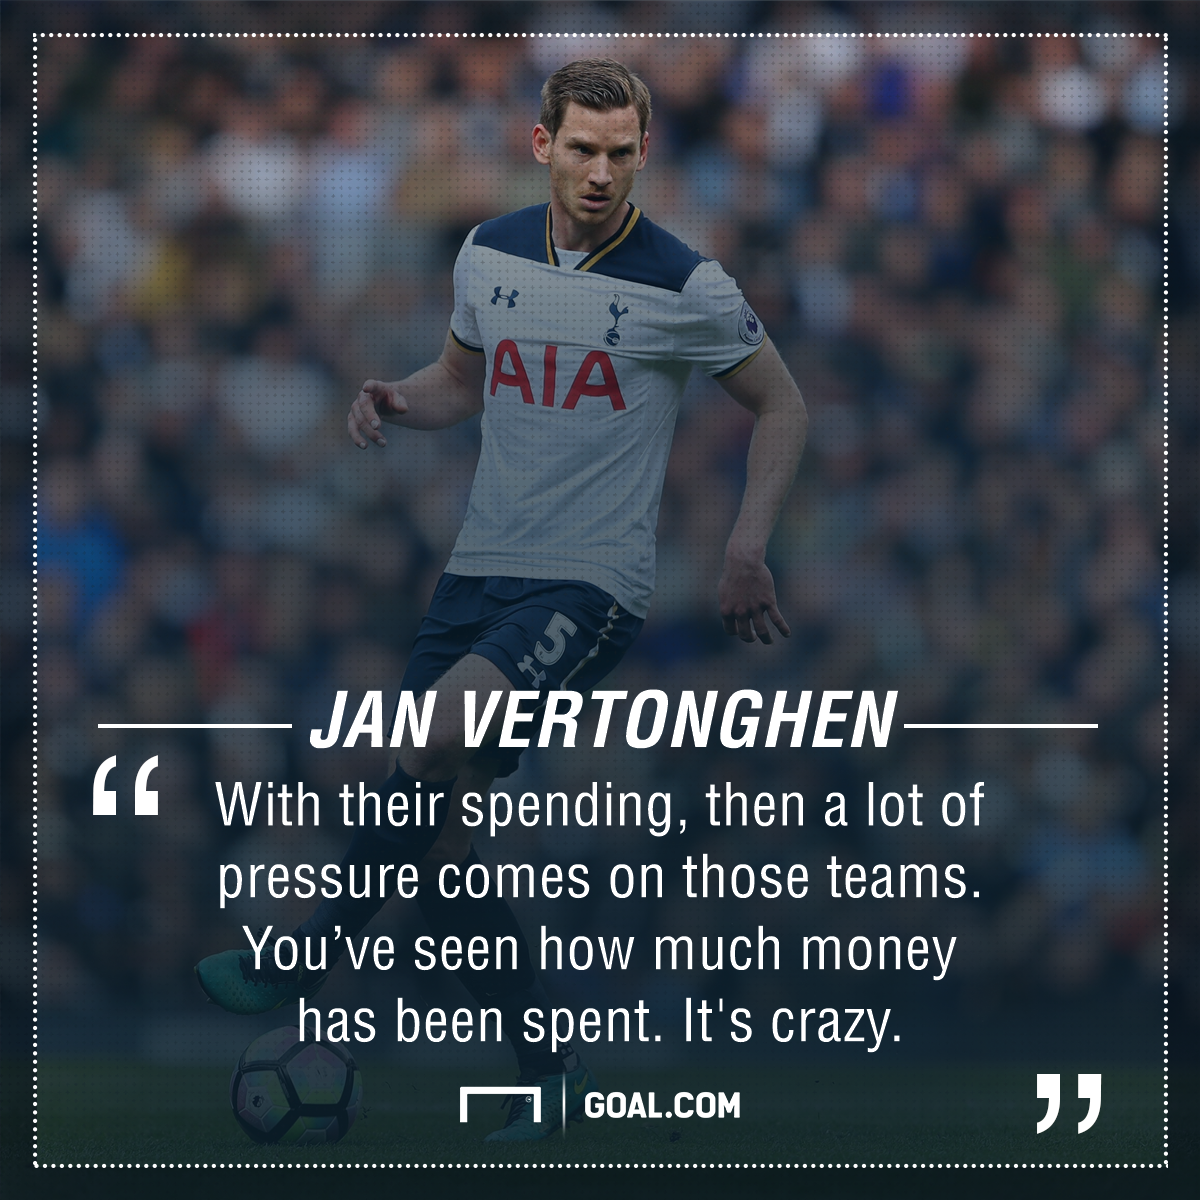 Jan Vertonghen Tottenham Premier League spending